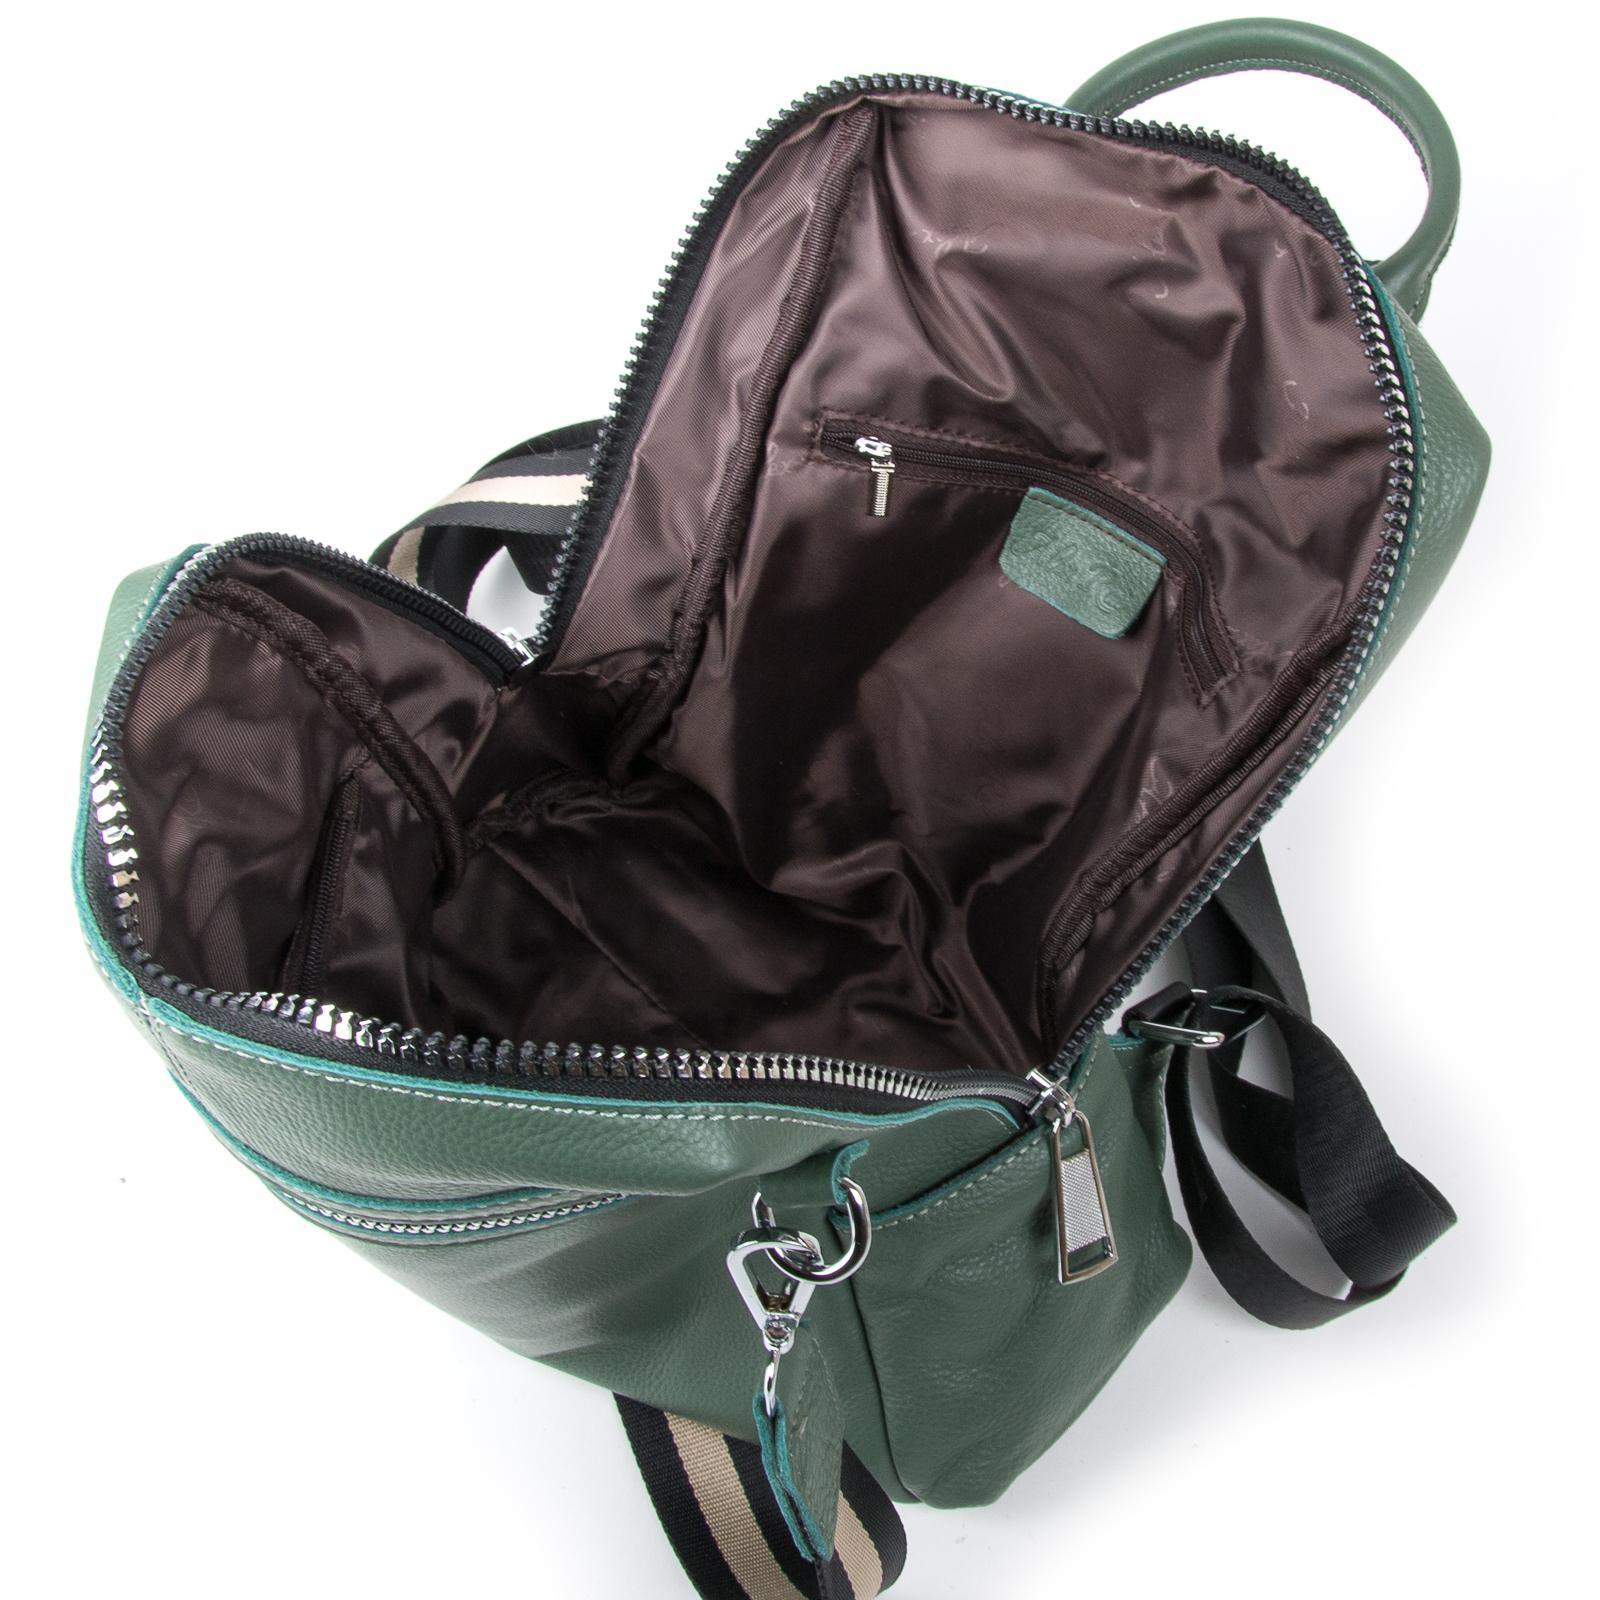 Сумка Женская Рюкзак кожа ALEX RAI 03-01 8781-9 green - фото 5